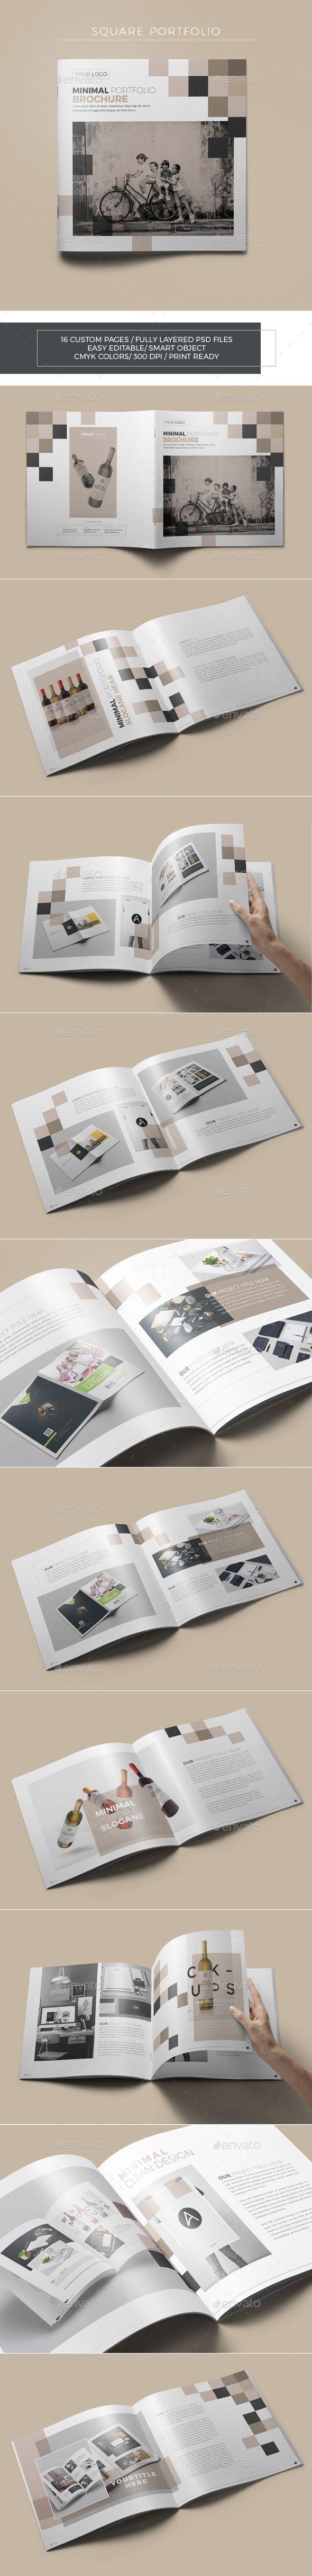 Minimal Square Portfolio  — PSD Template #elegant #a4 • Download ➝ https://graphicriver.net/item/minimal-square-portfolio/18047173?ref=pxcr